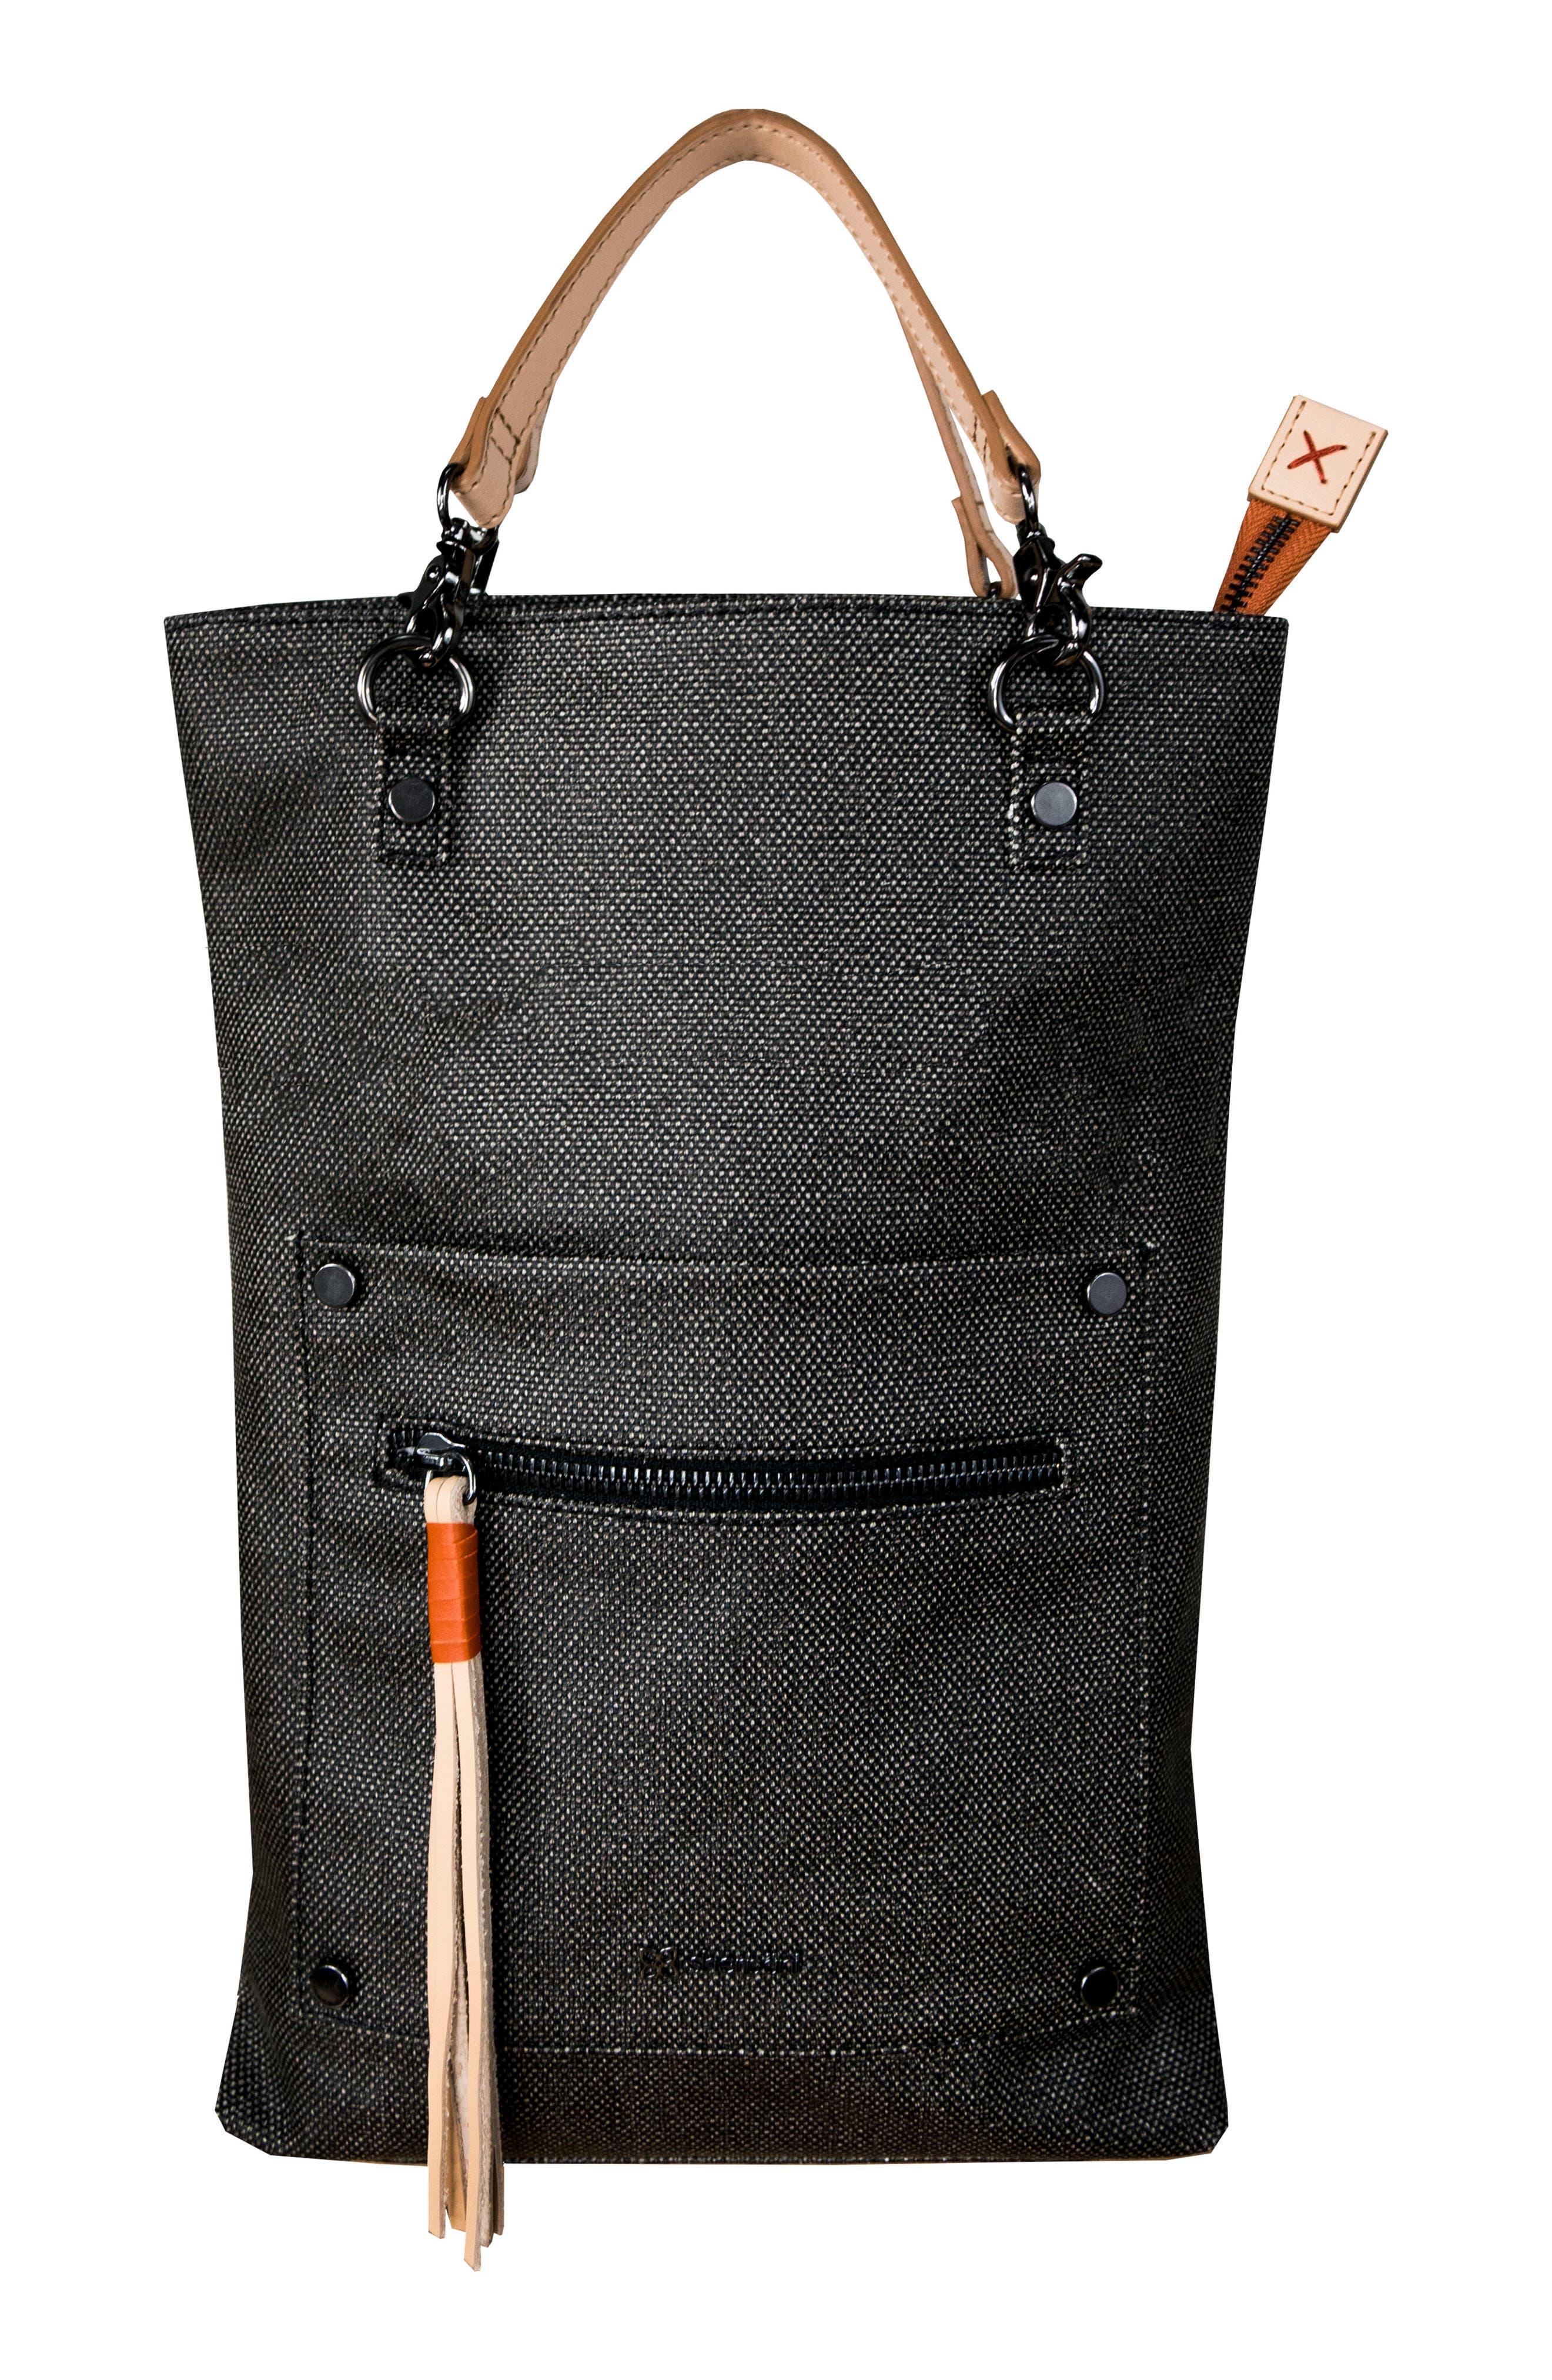 Rebel Coated Canvas Crossbody Bag,                             Alternate thumbnail 5, color,                             Blackstone